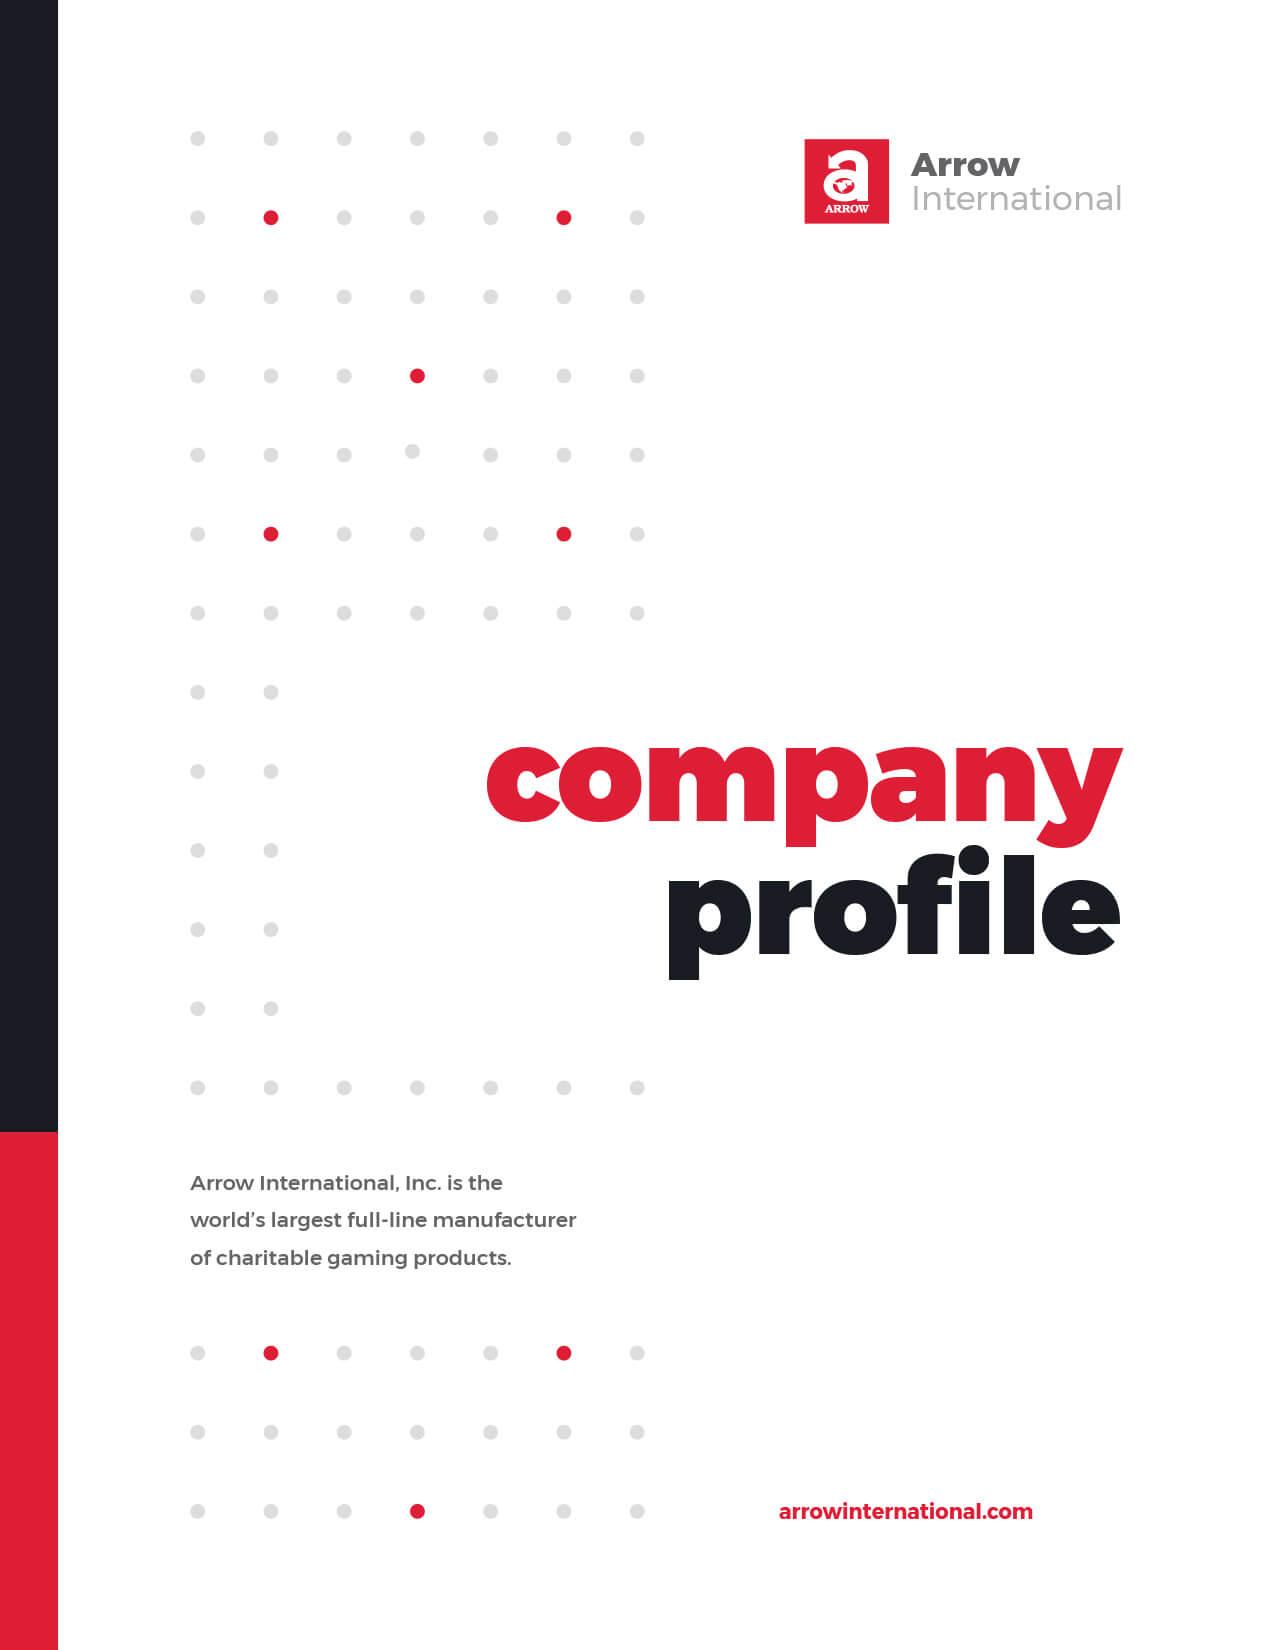 Arrow International Company Profile